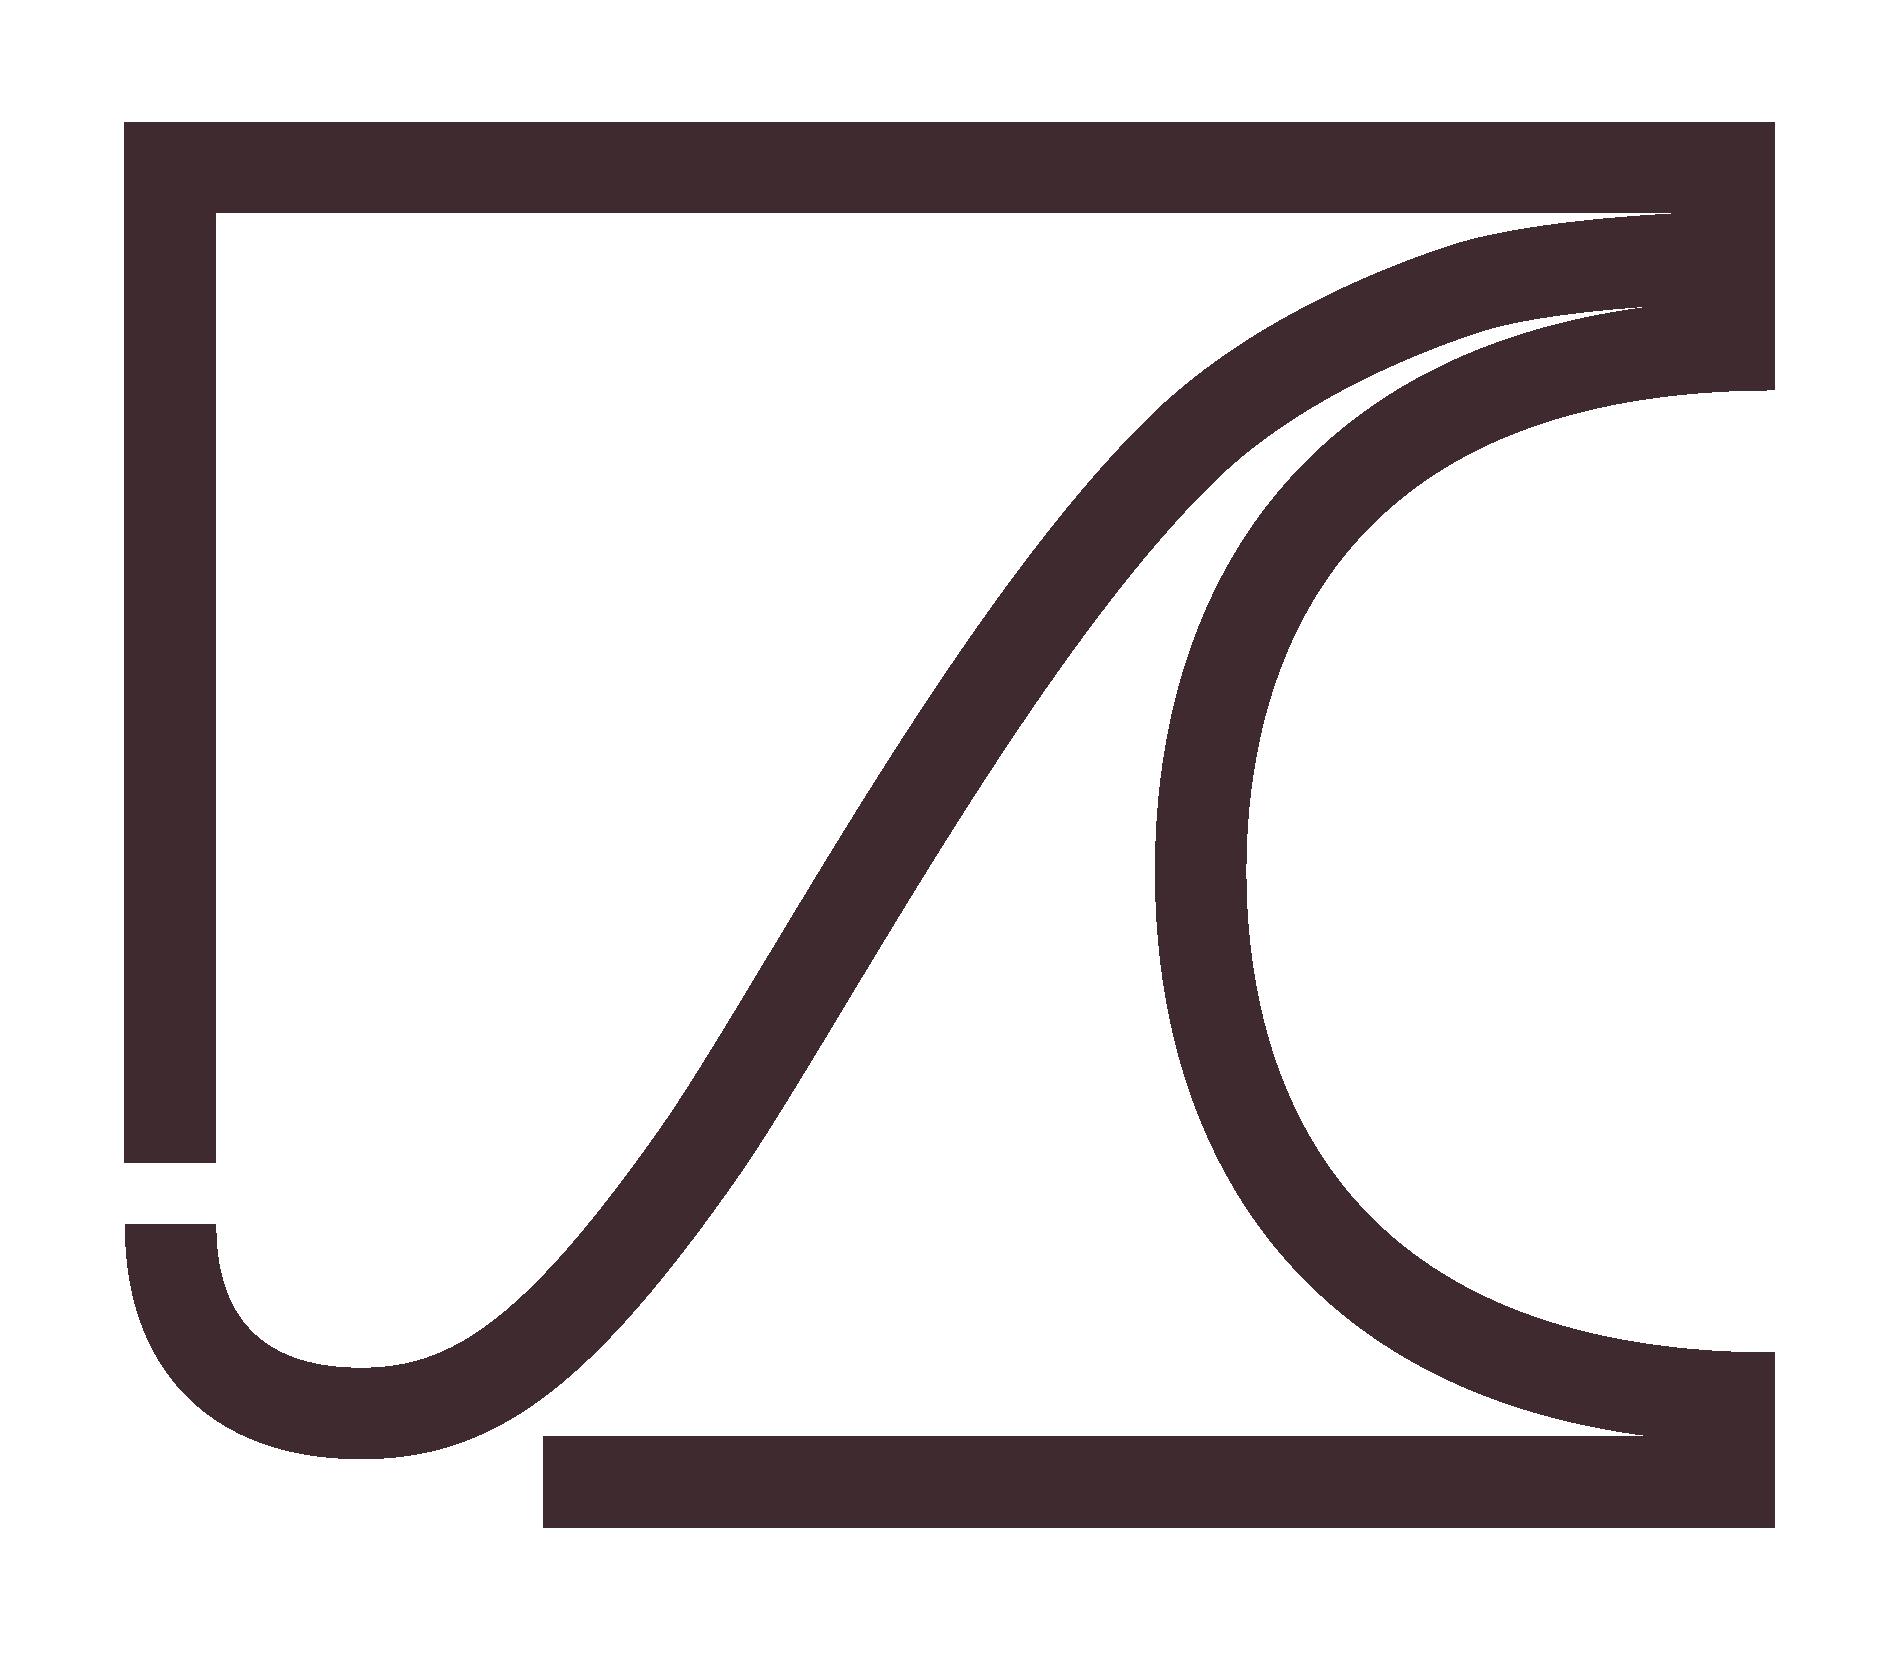 JoChiang-Plum-STAMP.png